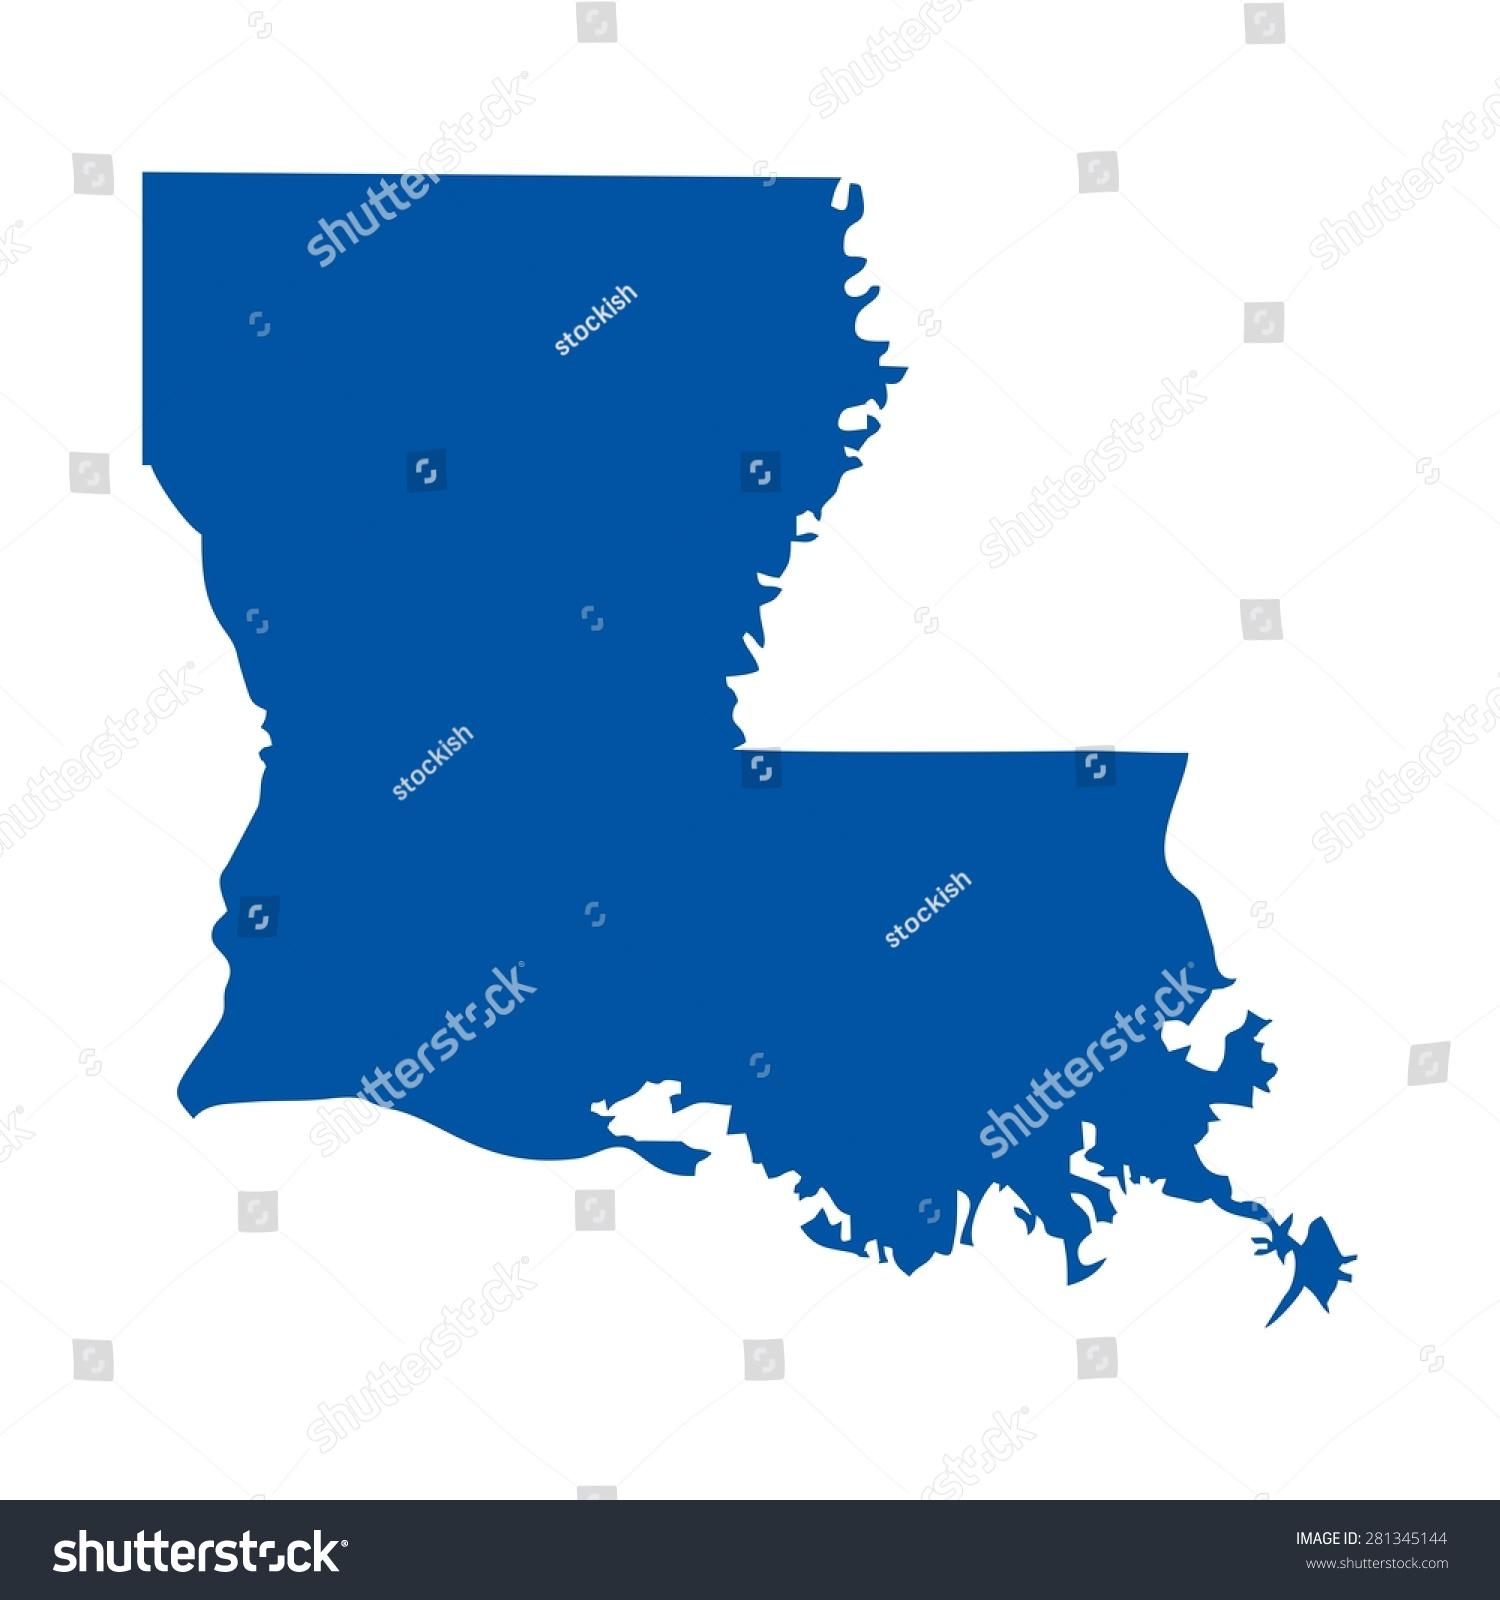 Louisiana Usa State Map Fleur De Stock Vector Shutterstock - Louisiana in usa map